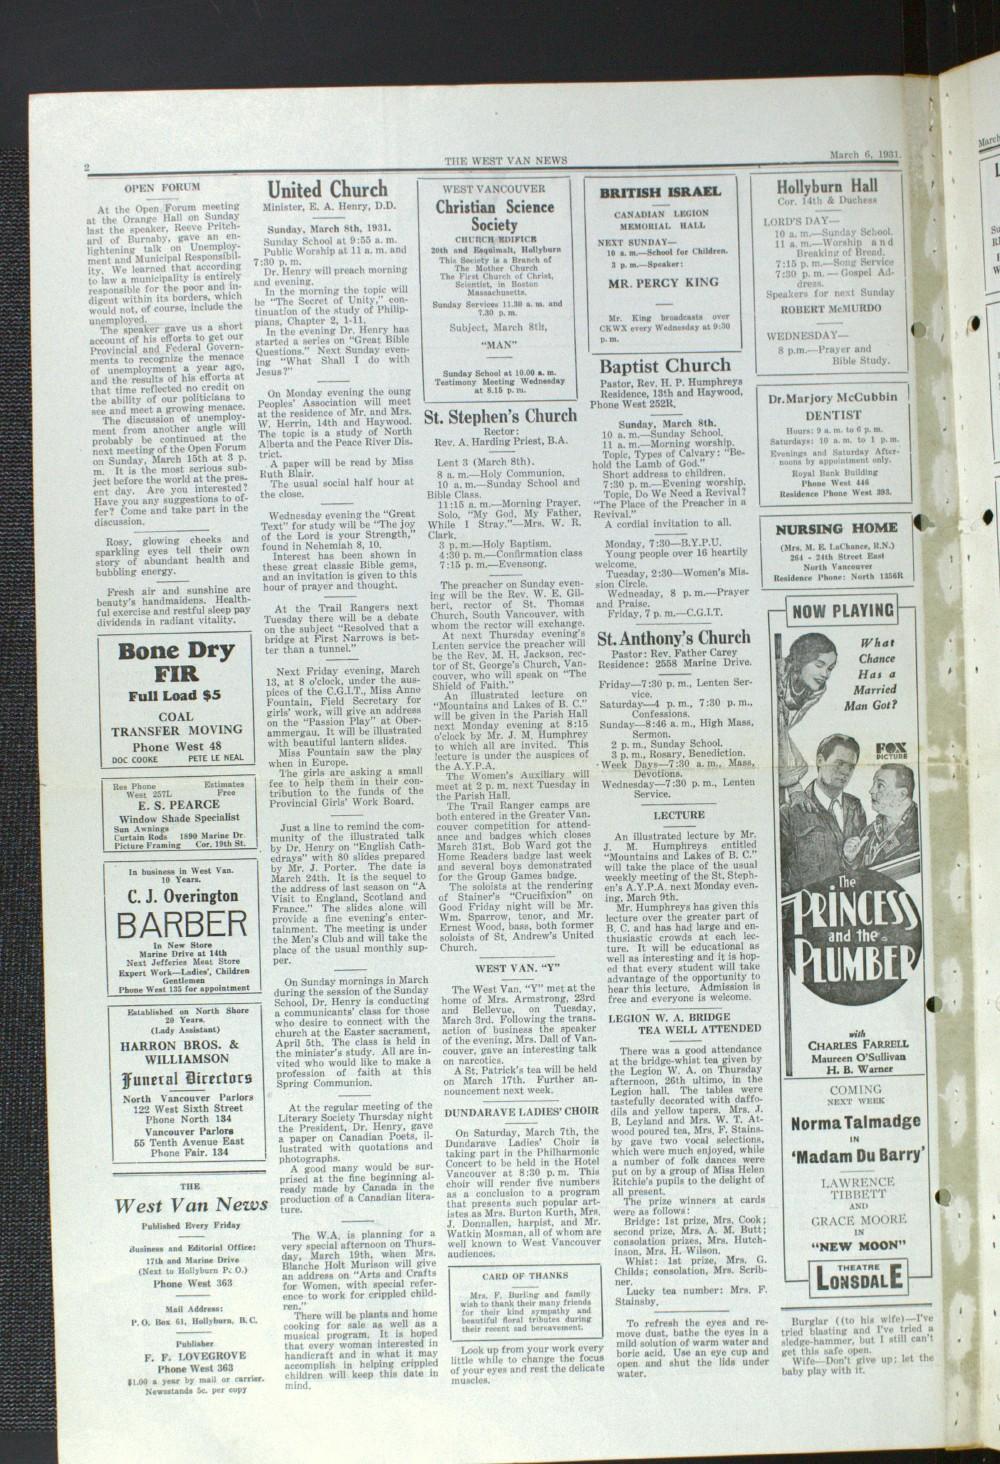 West Van. News (West Vancouver), 6 Mar 1931